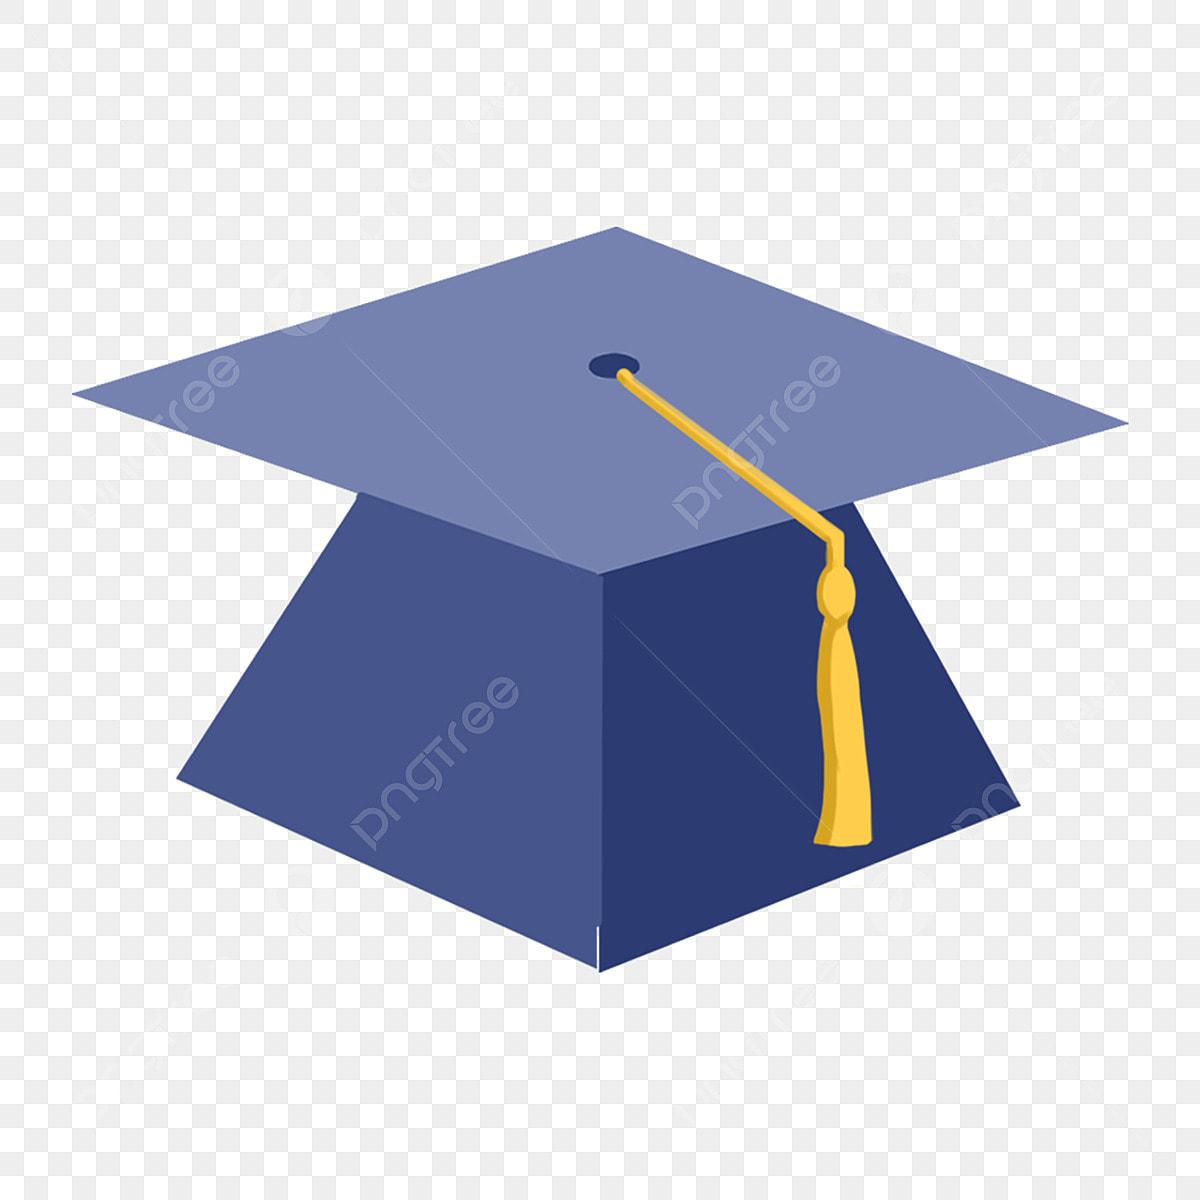 FULL TUTORIAL | My Money GRADUATION CAP with tassel and DIPLOMA ... | 1200x1200